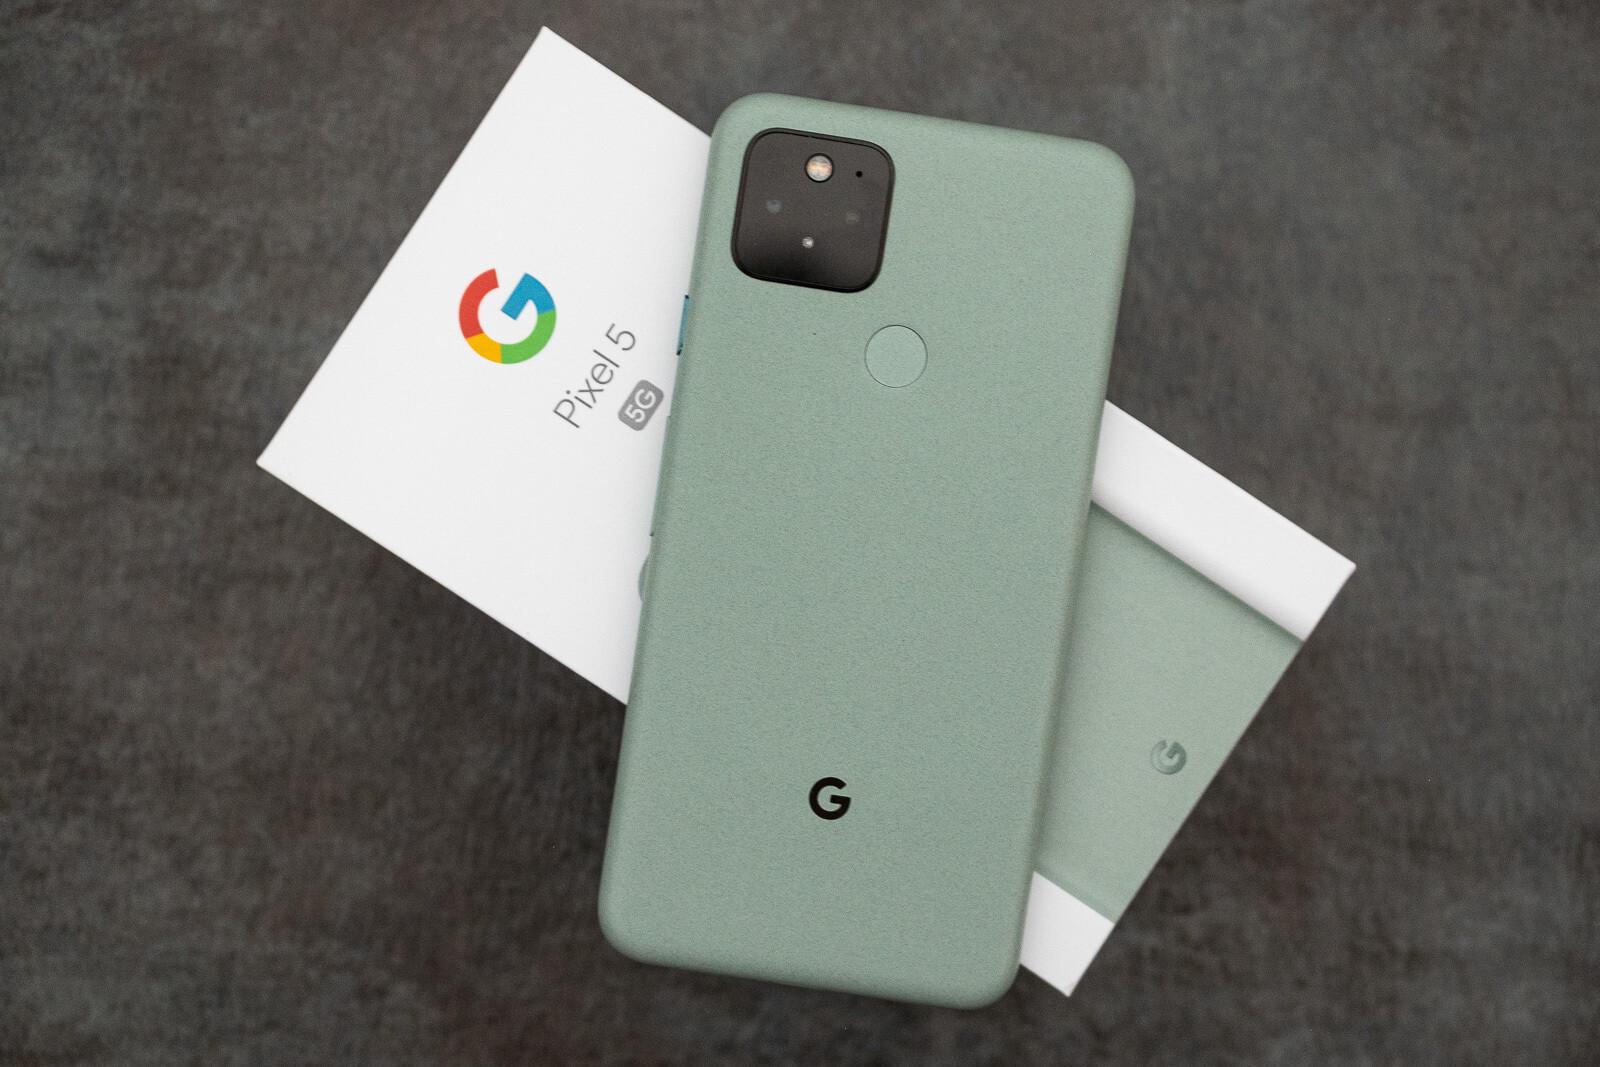 Google Pixel 5 in Sorta Sage - Samsung Galaxy S21 vs Google Pixel 5